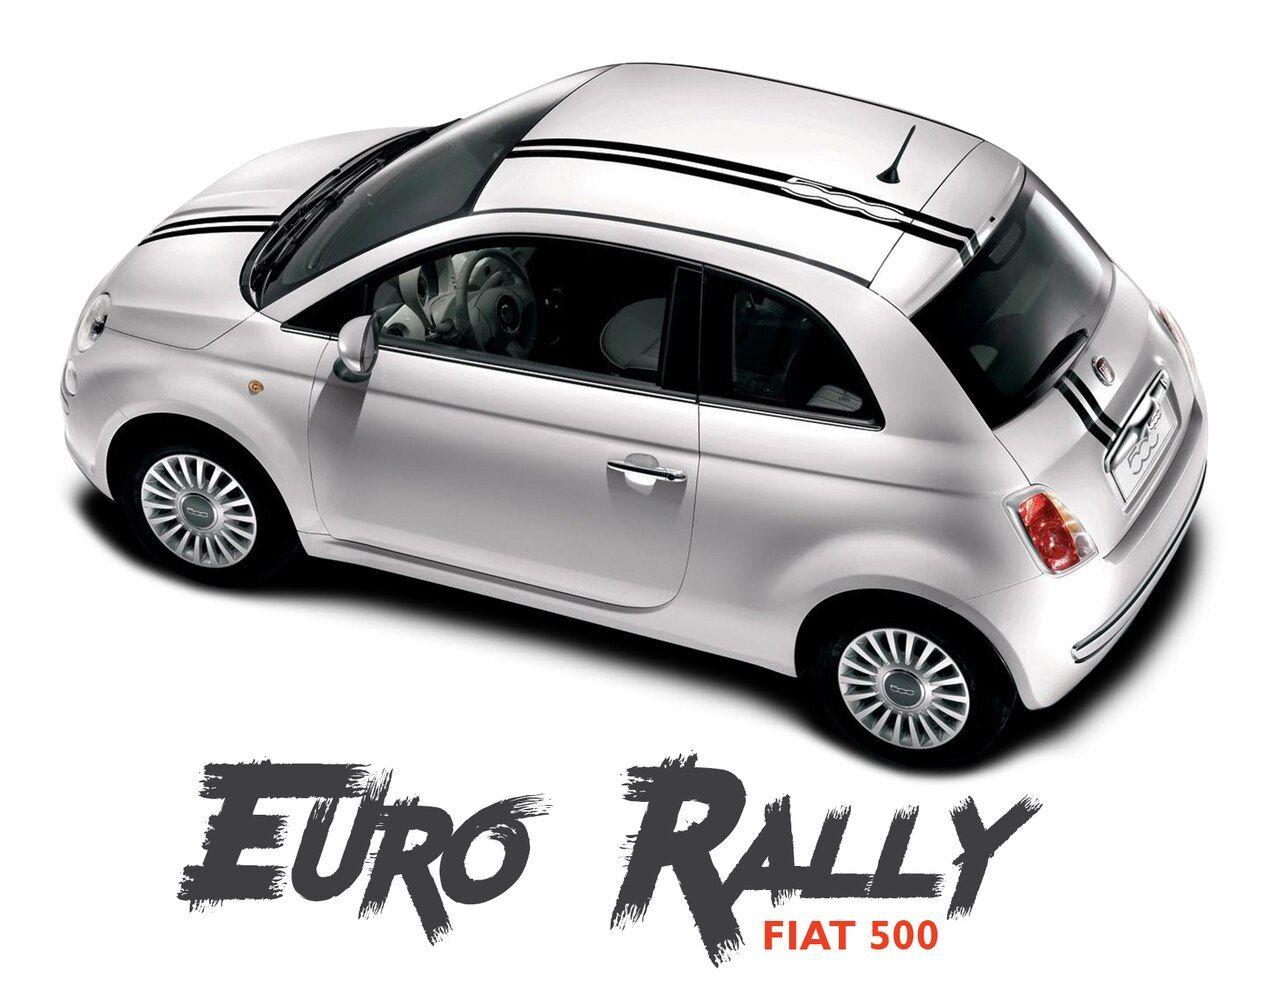 Fiat 500 Euro Rally Offset Hood Roof Racing Vinyl Graphics Stripes Decals Kit For 2007 2018 Models Fiat 500 Vinyl Graphics Fiat [ 1006 x 1280 Pixel ]